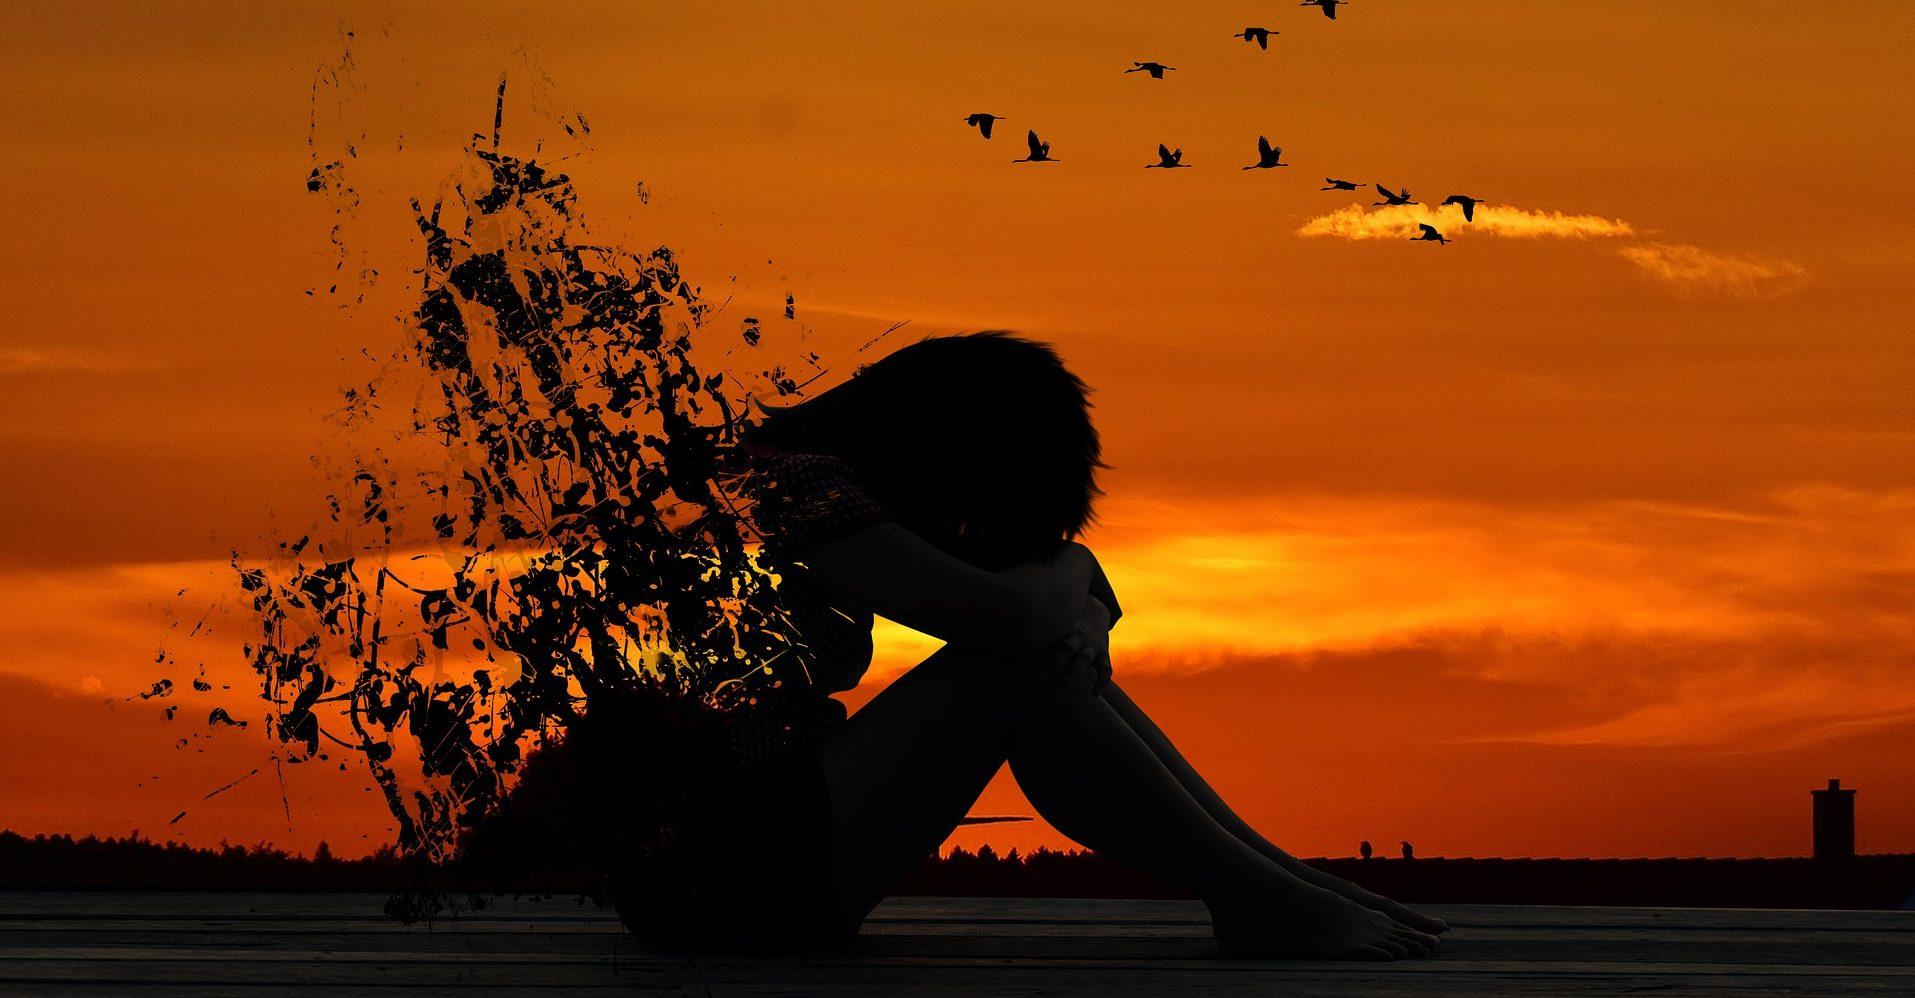 sunset-3087474_1920-e1518190661783